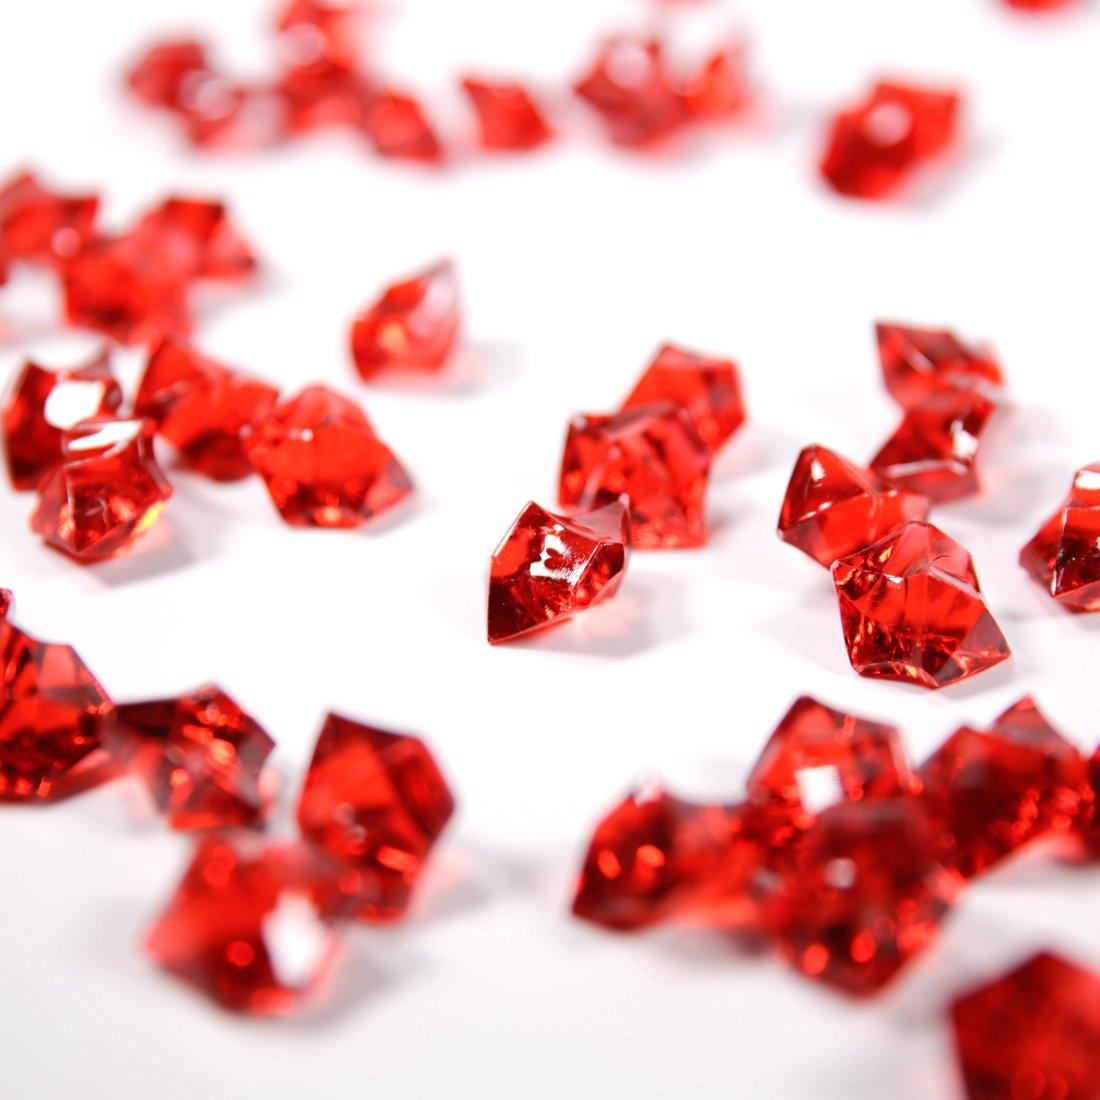 PAUBOLI Acrylic Fake Gems 1.2lbs (200pcs) +$ Money Bag a Set Vase Fillers Wedding Party Decorations Pretend Pirate Treasure Jewels (Ruby Red)